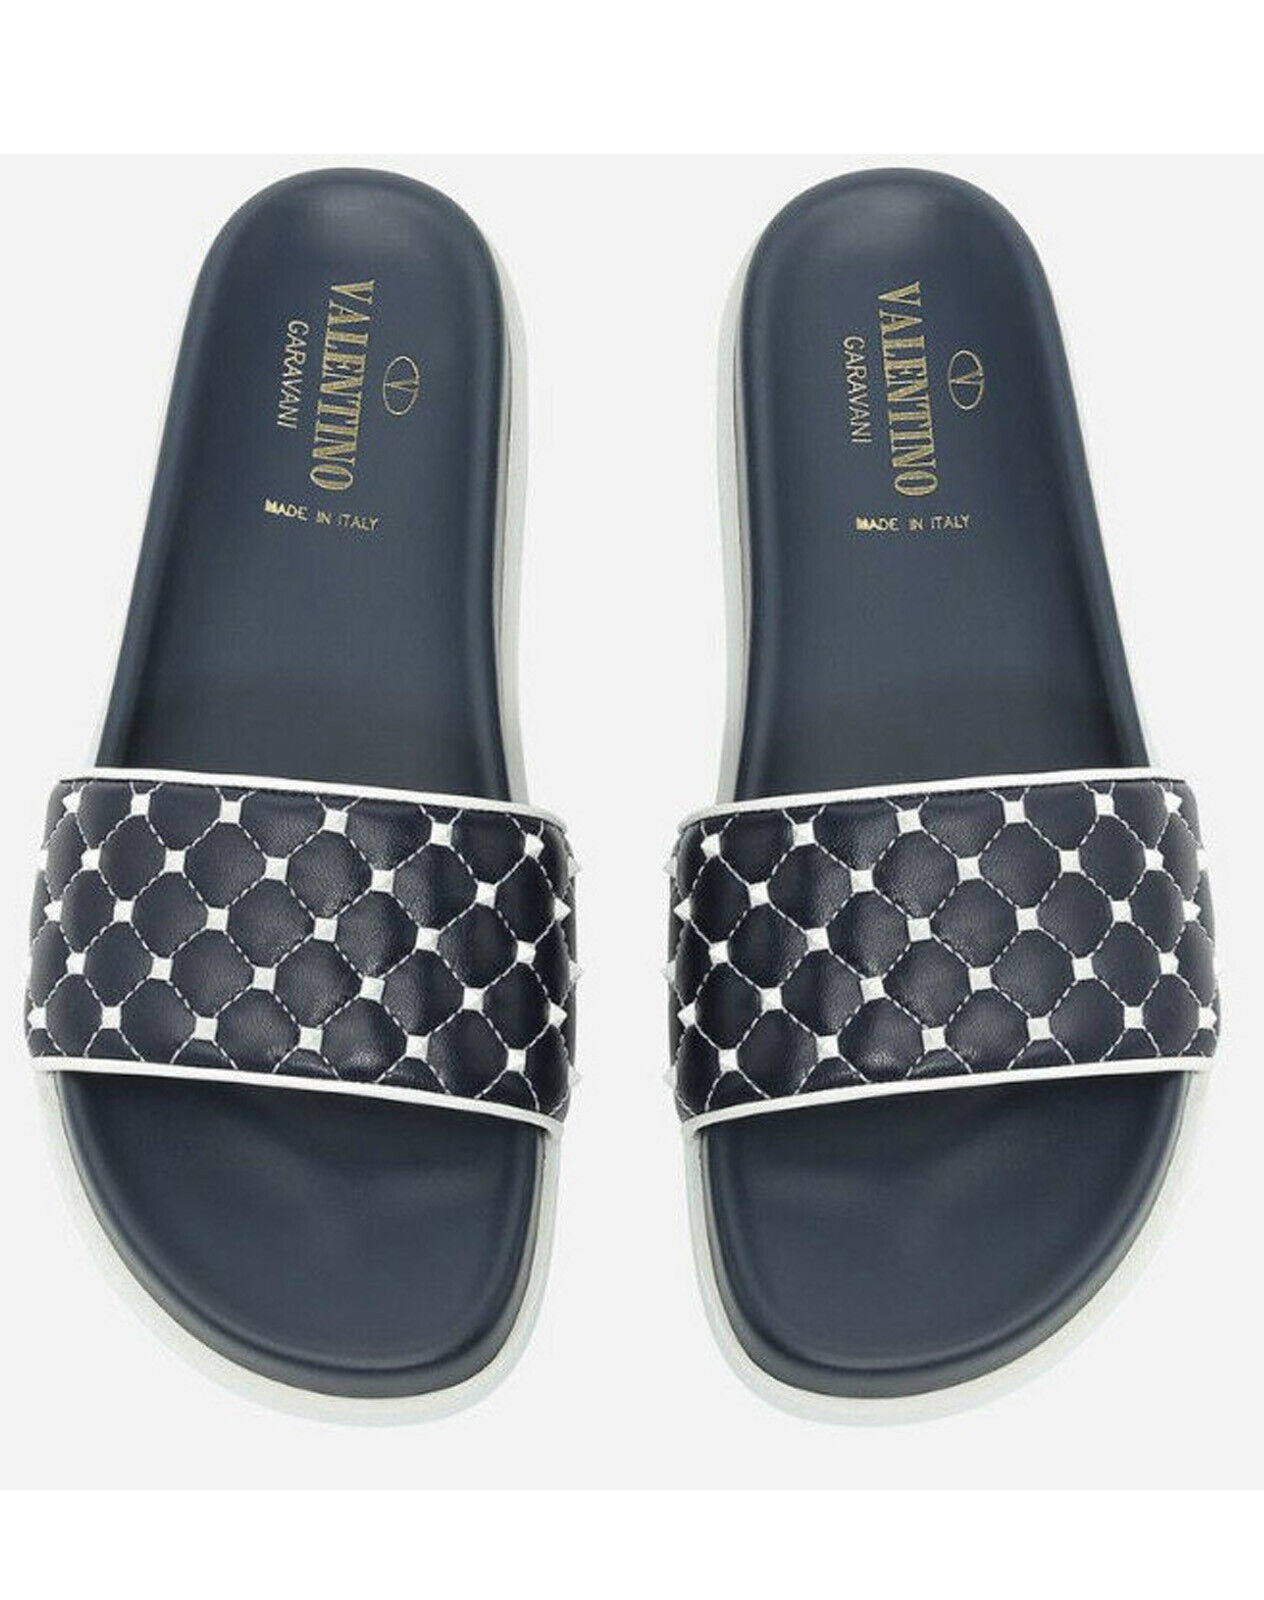 VALENTINO Garavani Free Rockstud Spike Slide Slipper Marine White bluee Size 35